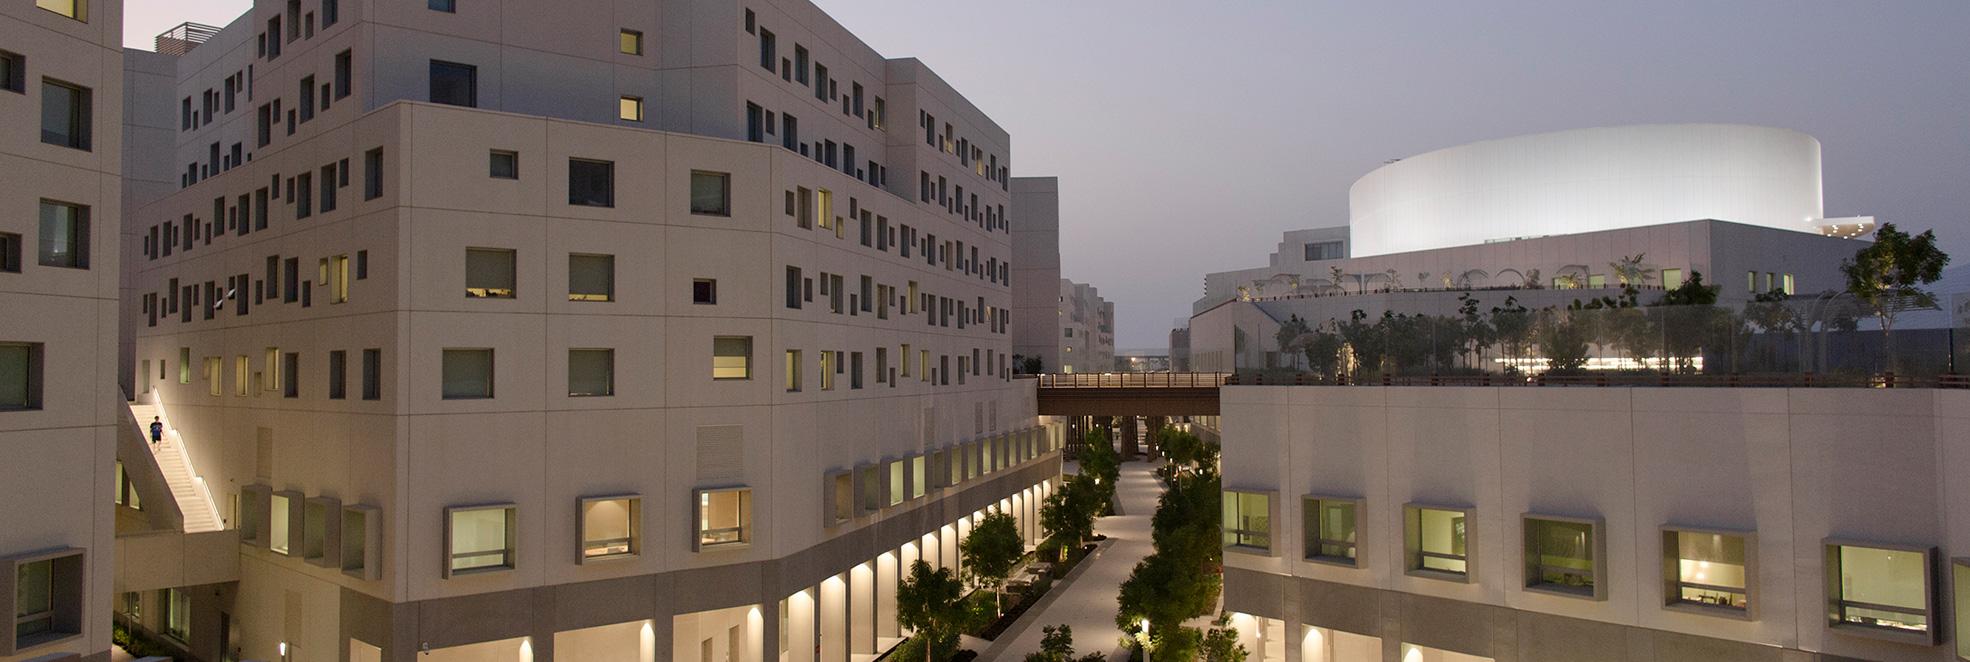 Campus Life Nyu Abu Dhabi